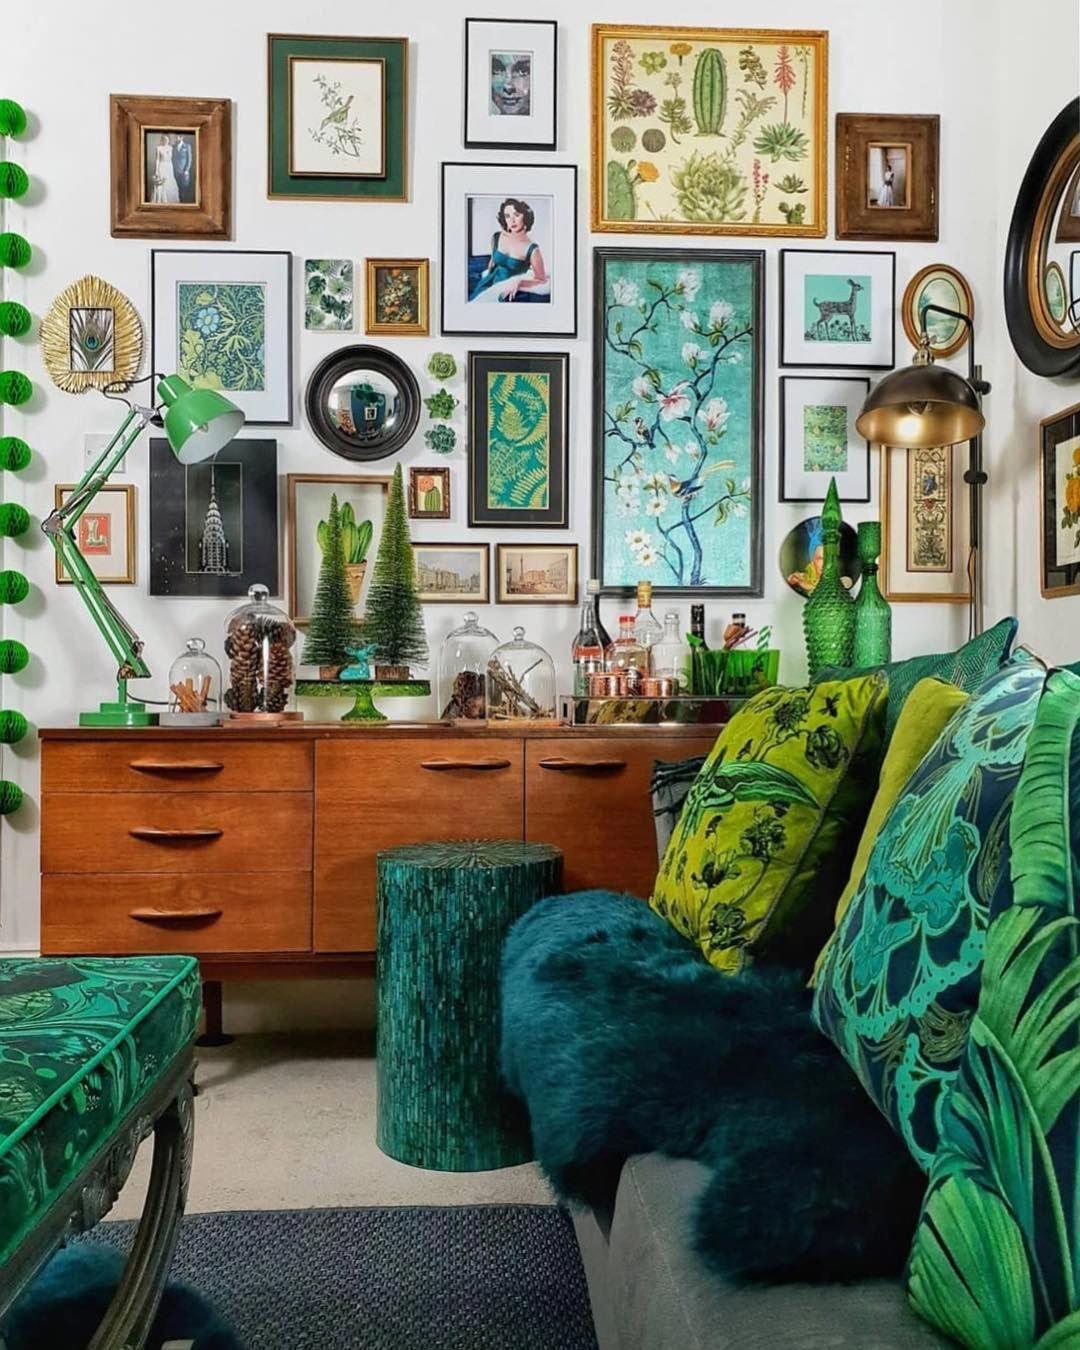 Diy Bohemian Decor Pinterest Bohemiandecor Vintage Living Room Decor Vintage Living Room Small Living Room Decor